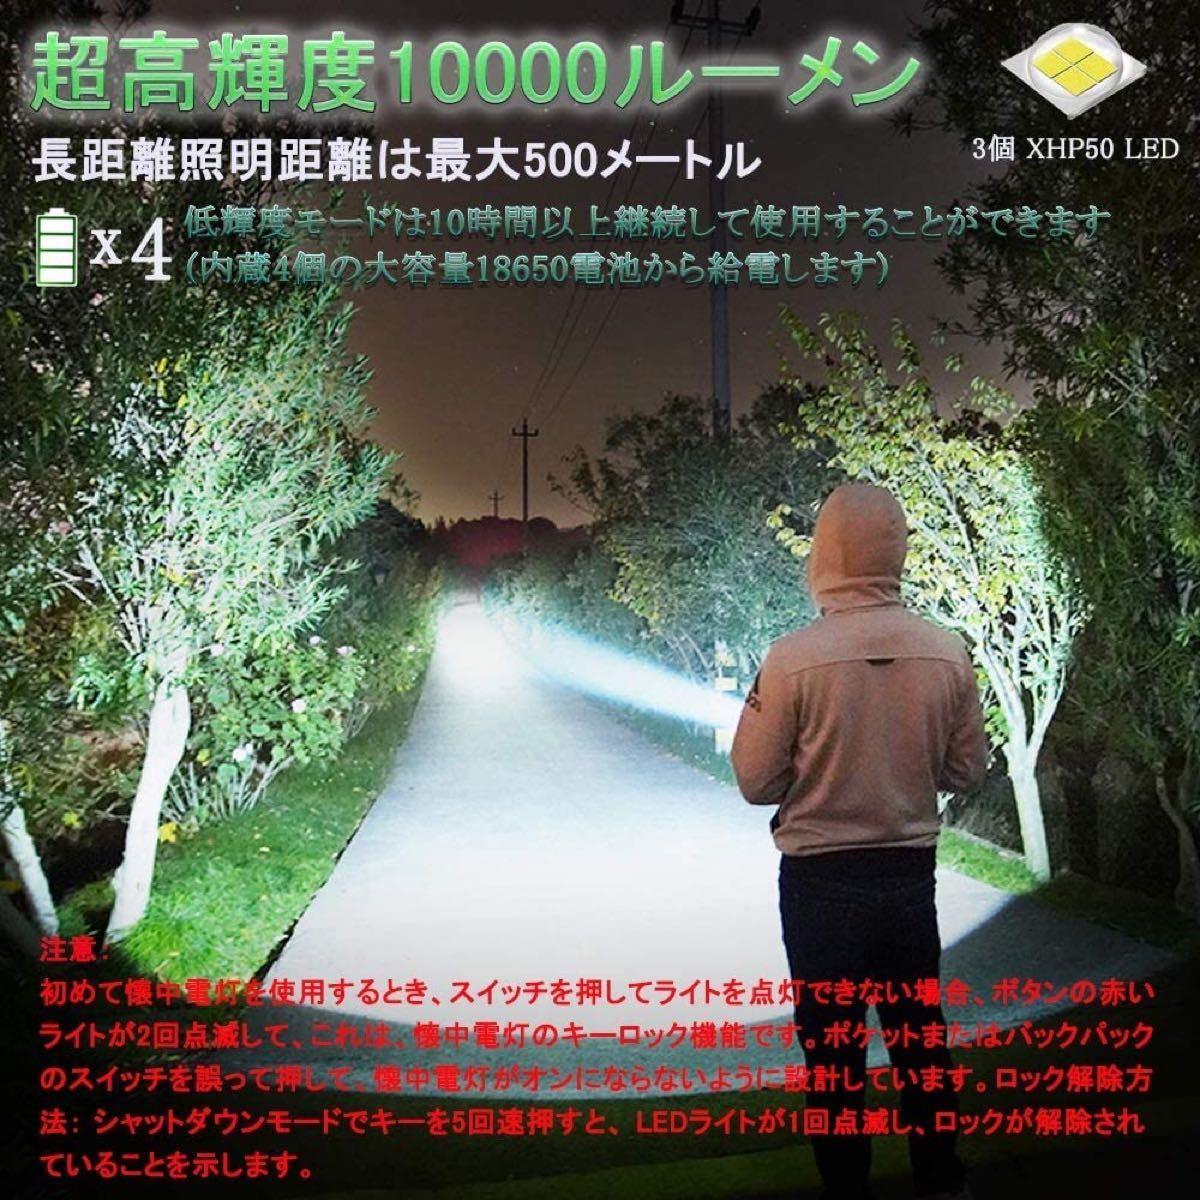 LED 懐中電灯 強力 軍用 最強 小型 USB充電式10000ルーメン